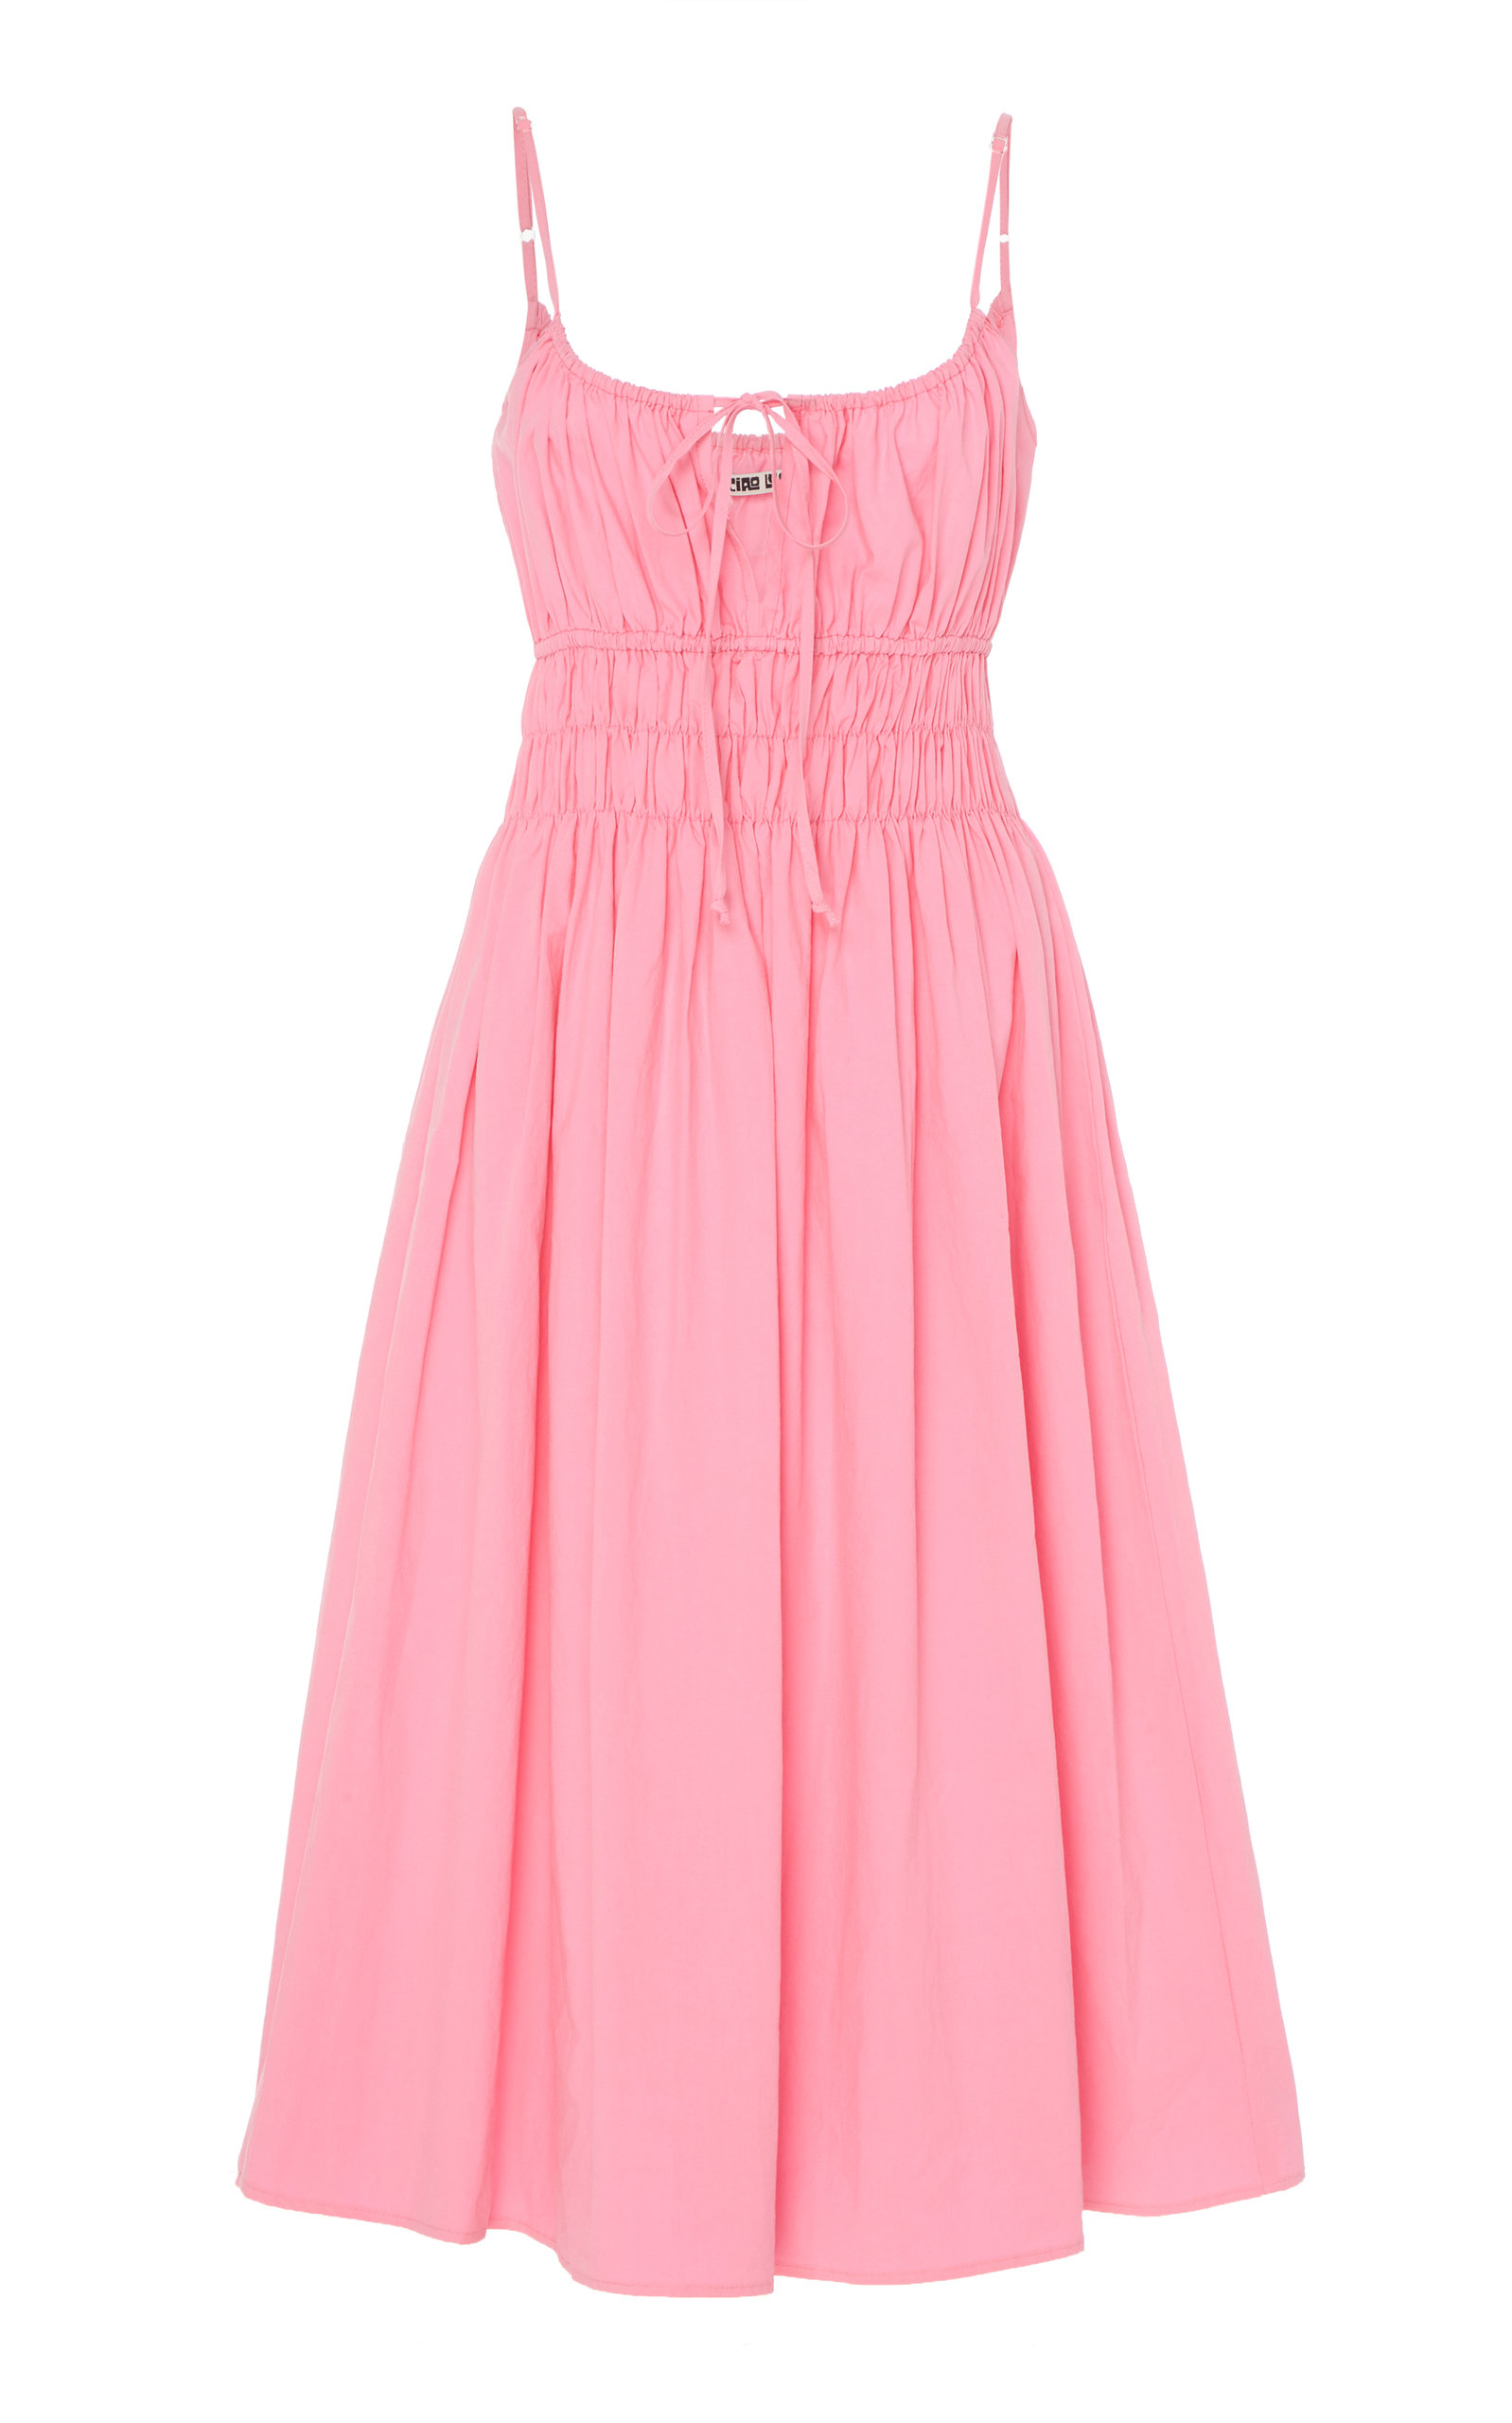 Ciao Lucia pink Gabriela dress.